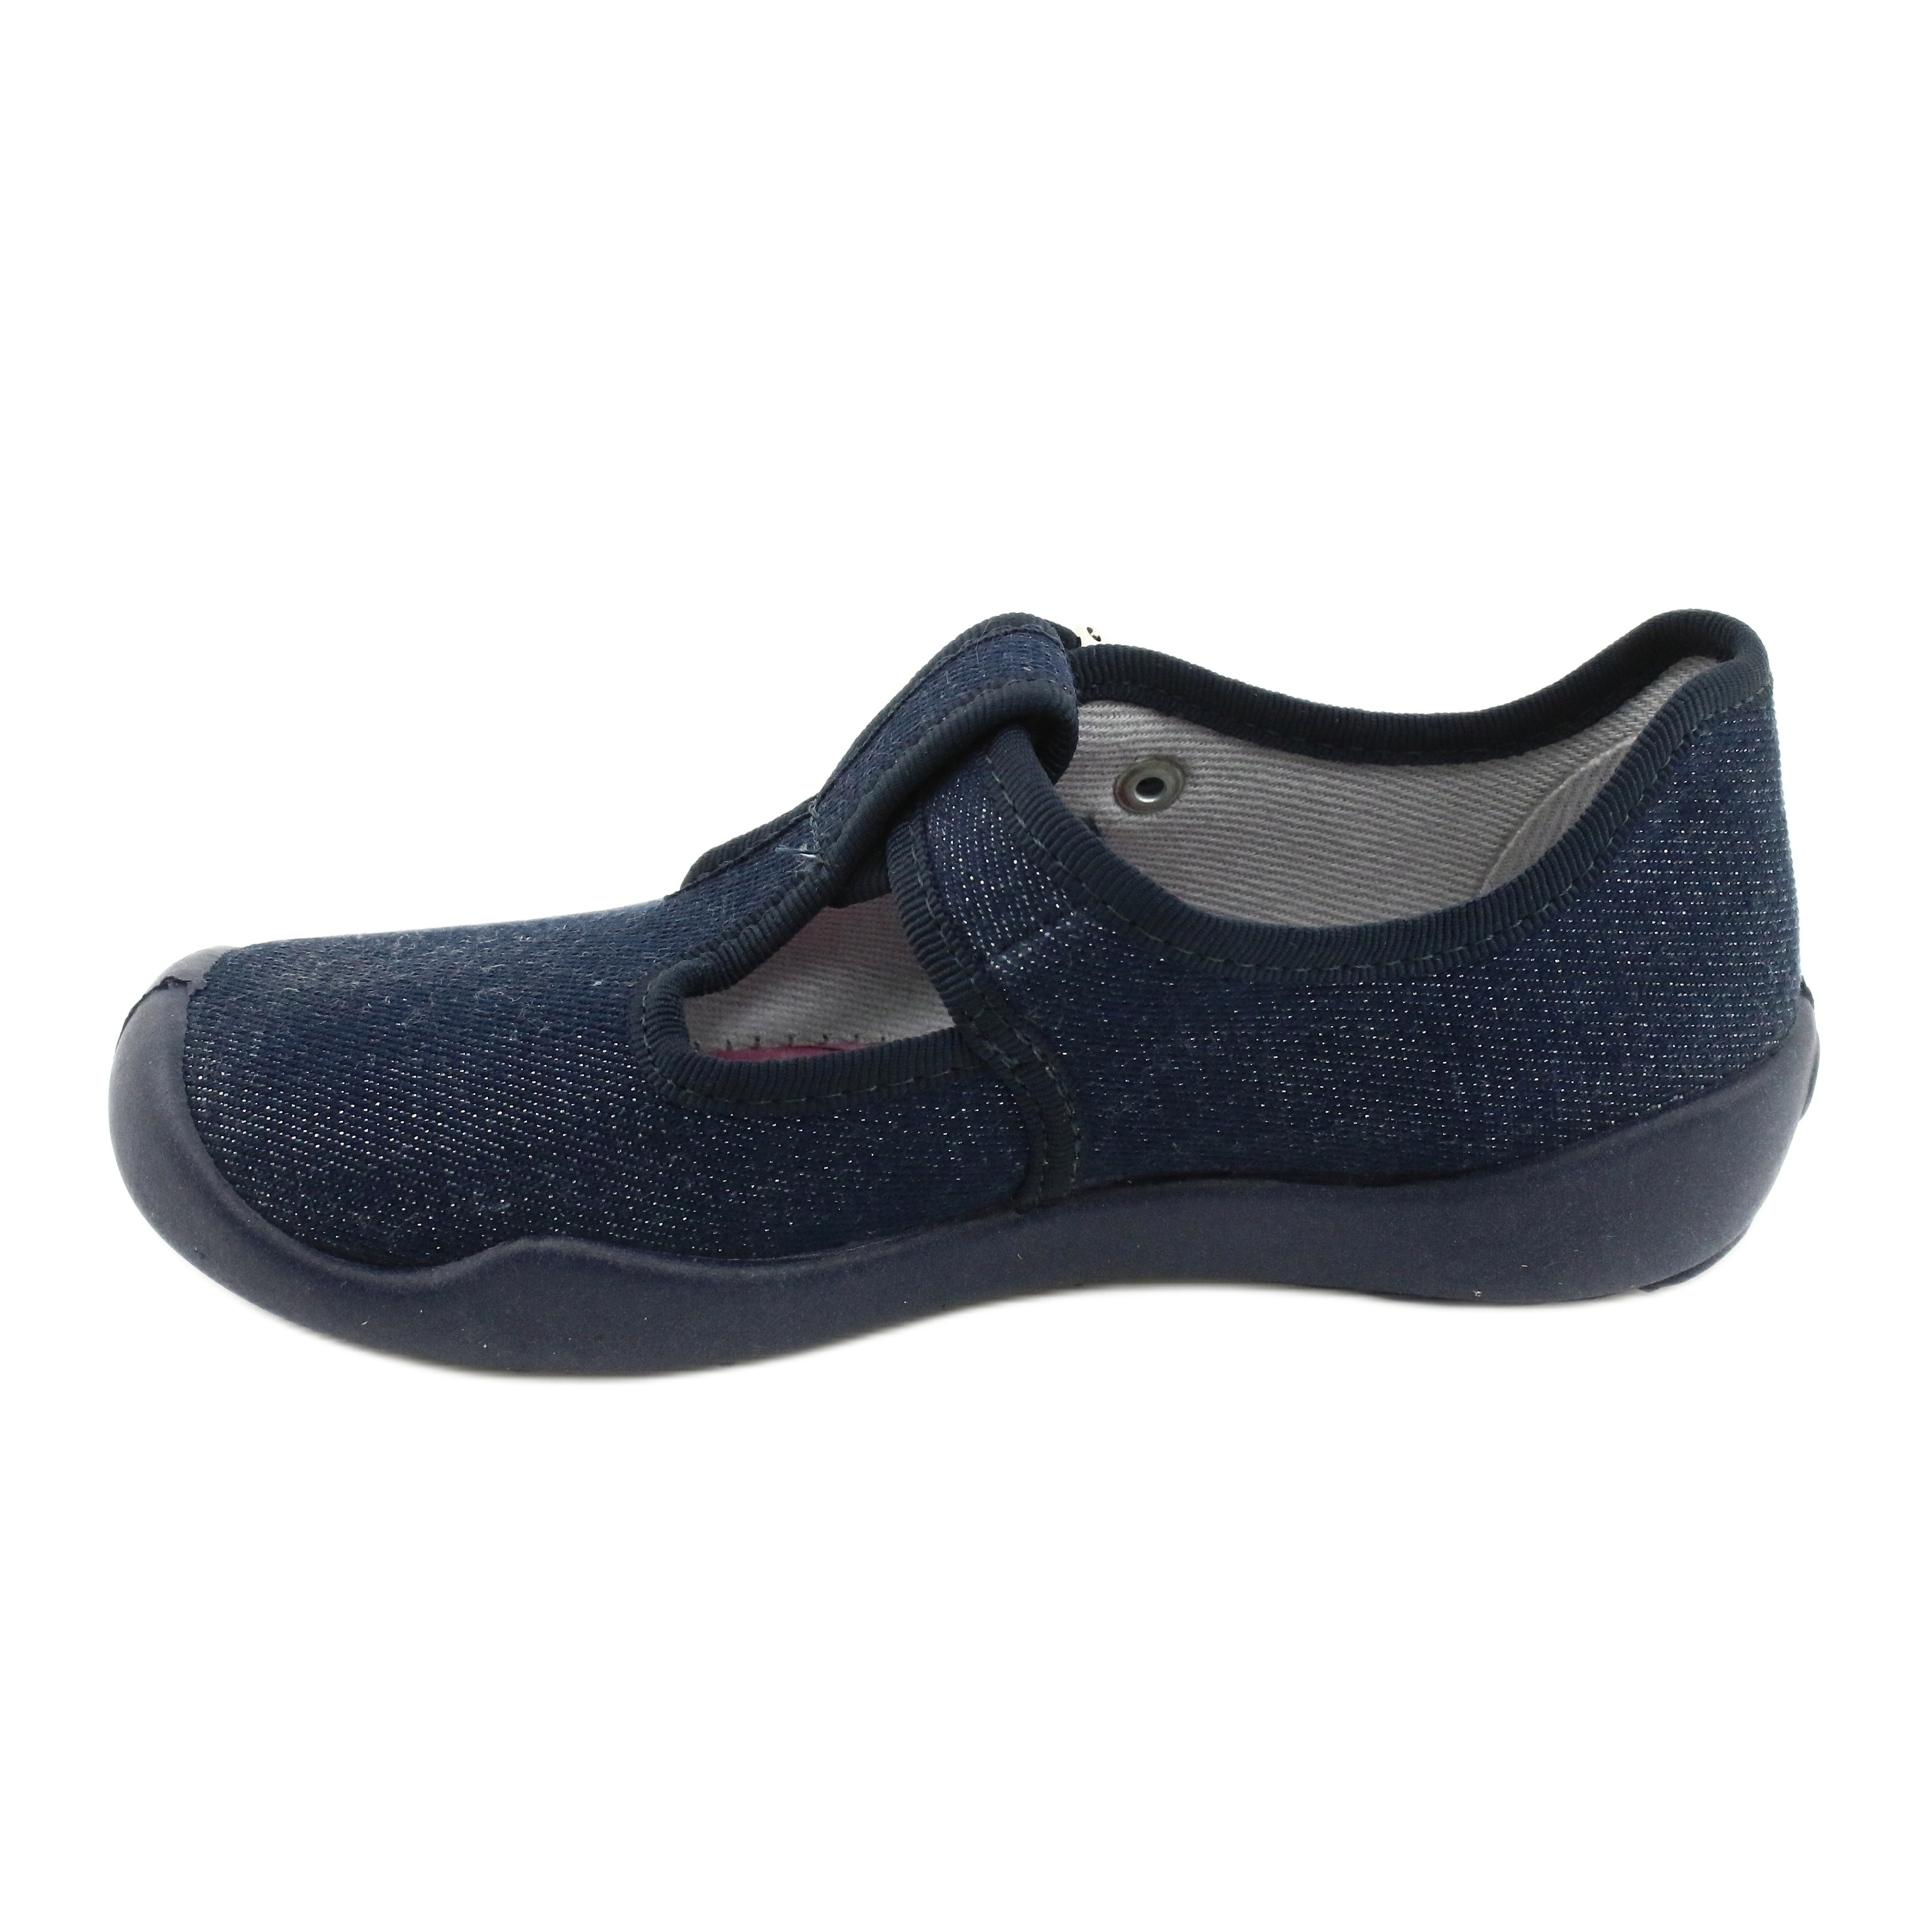 miniatura 4 - Scarpe per bambini Befado in bianco blu navy